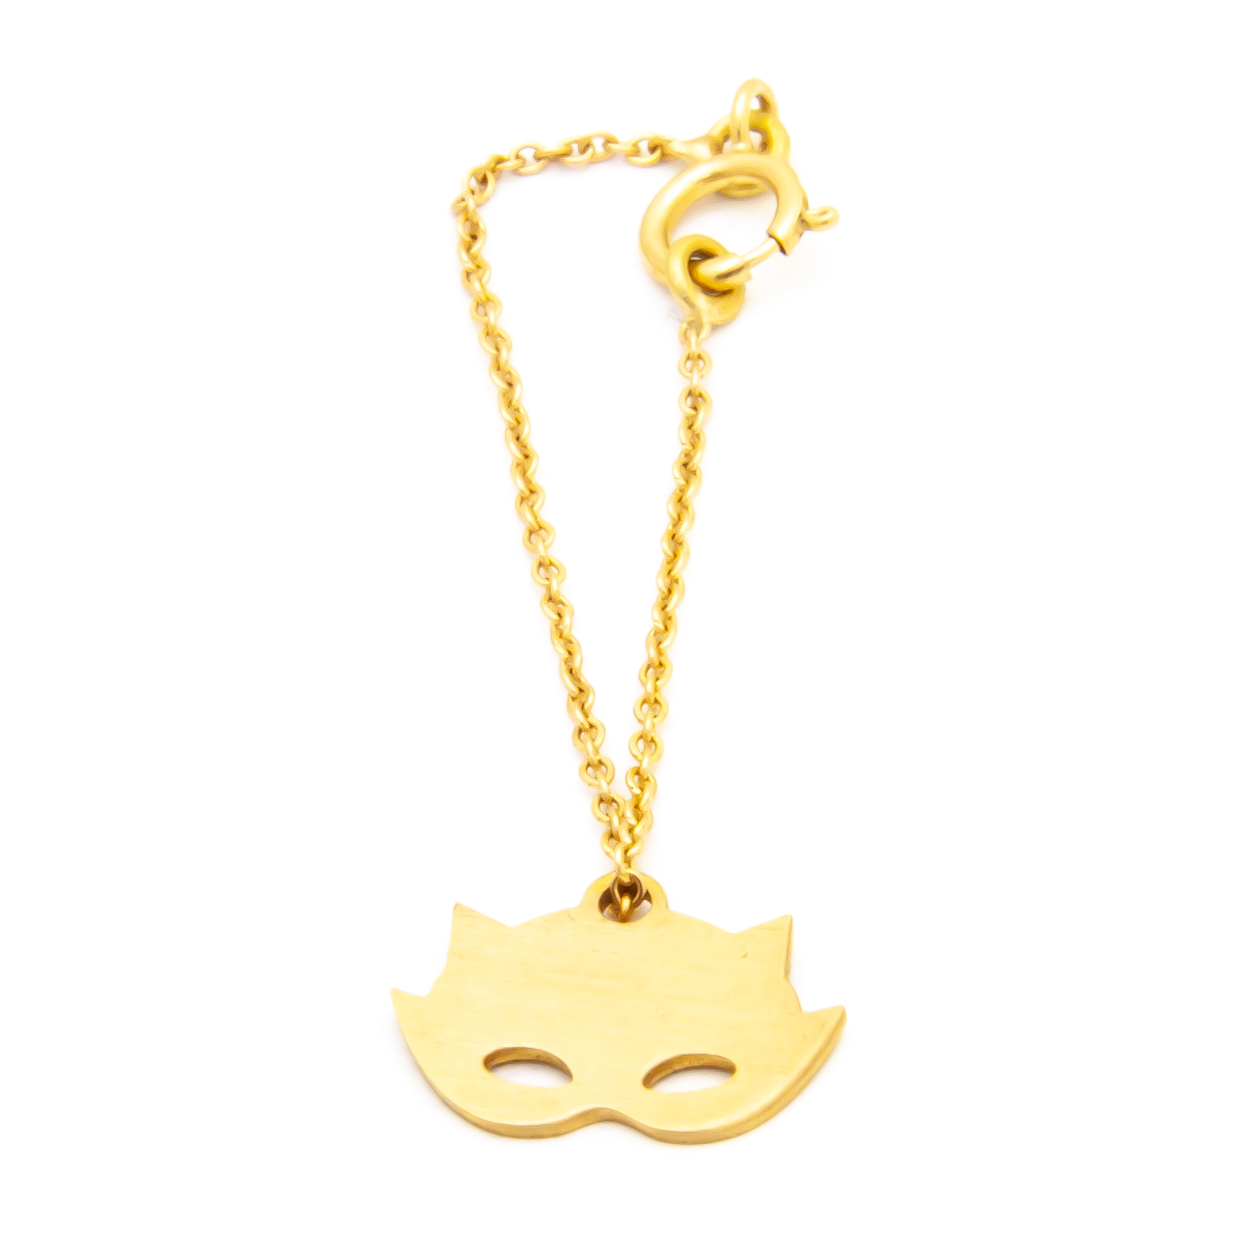 آویز ساعت طلا 18 عیار  زنانه غزال مدل گربه کد GGE018